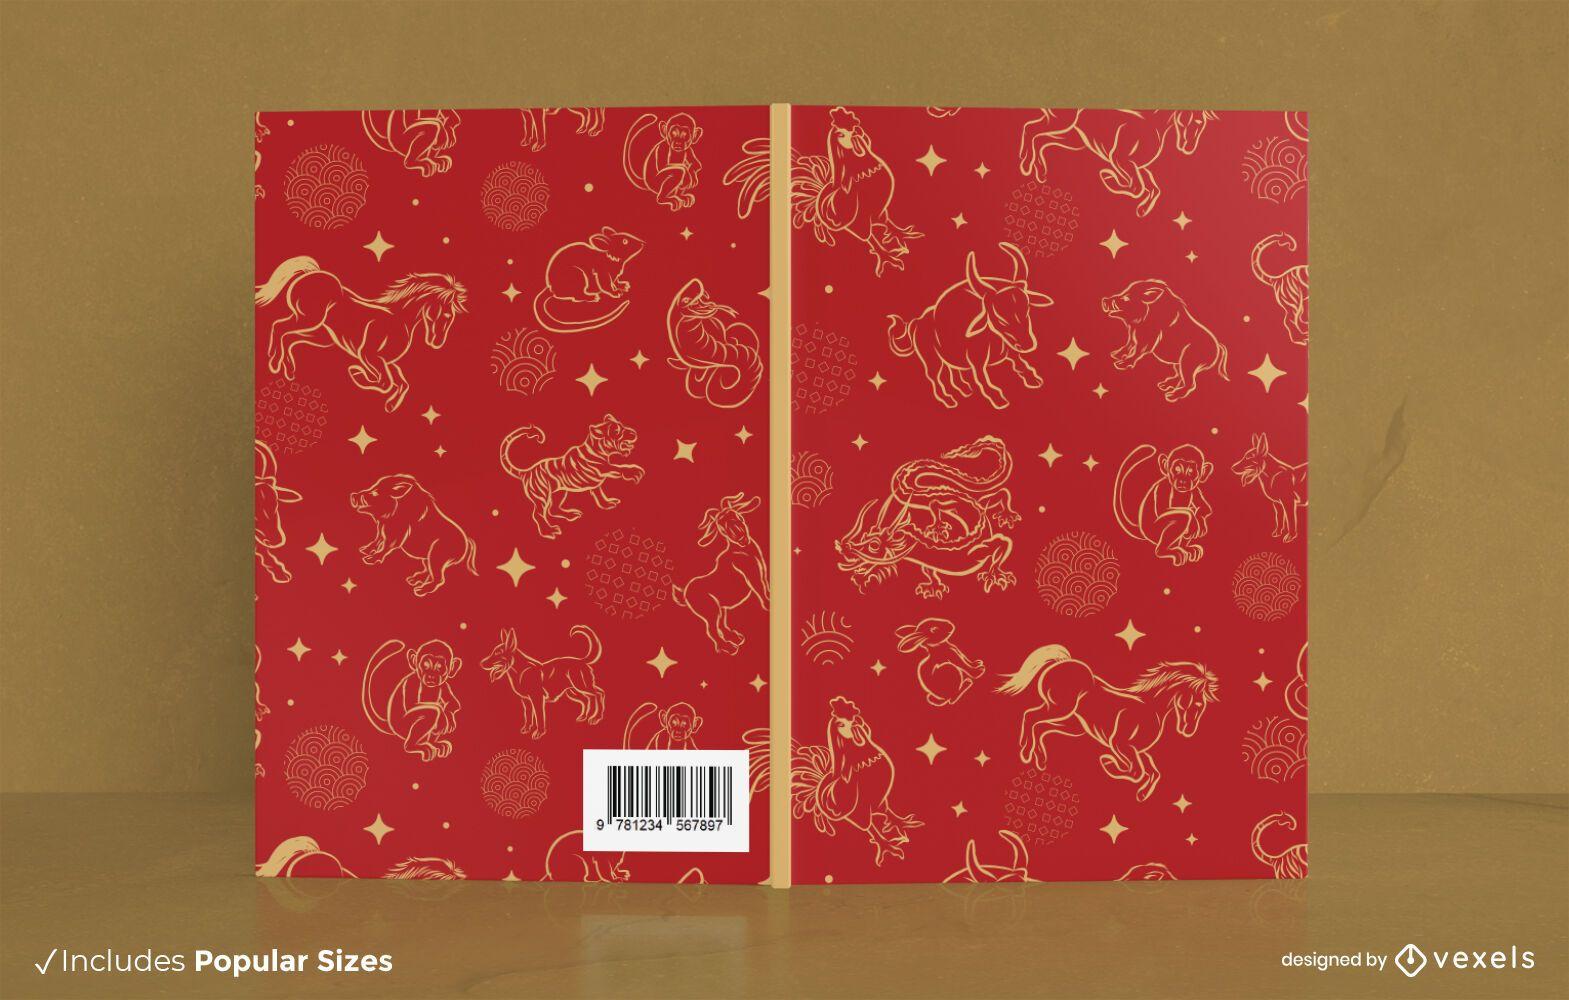 Chinese zodiac animals book cover design